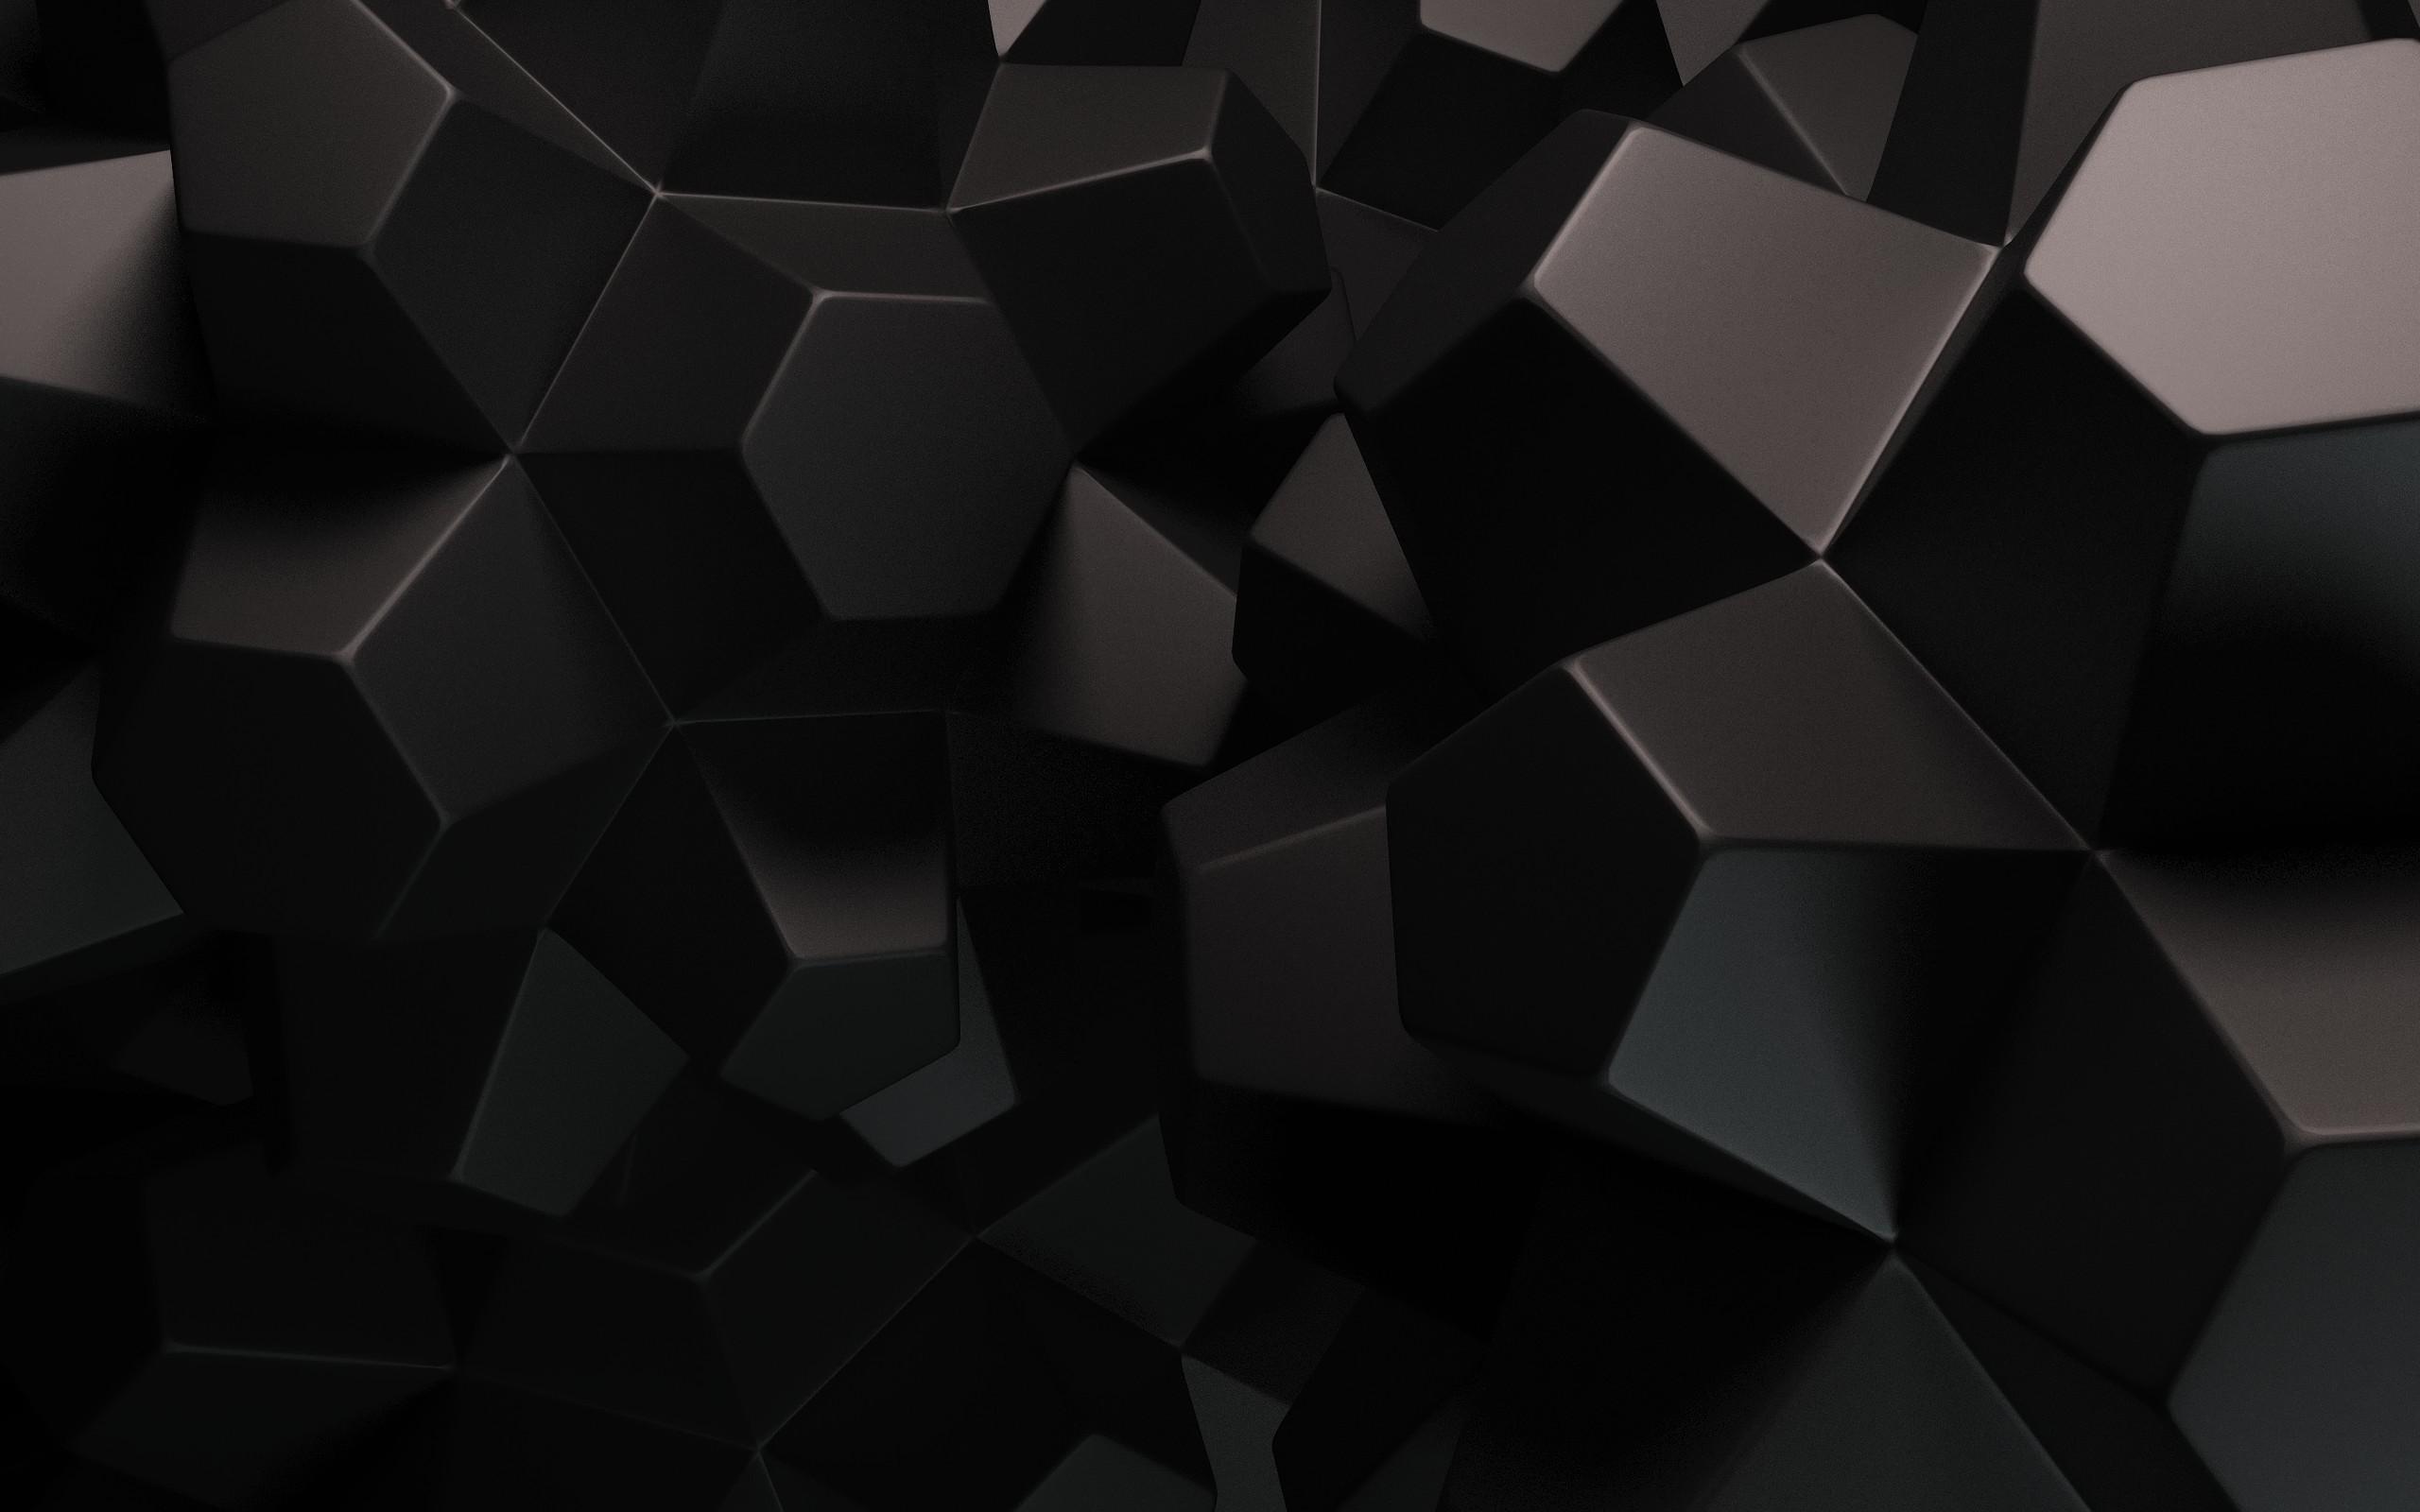 cool black background wallpaper